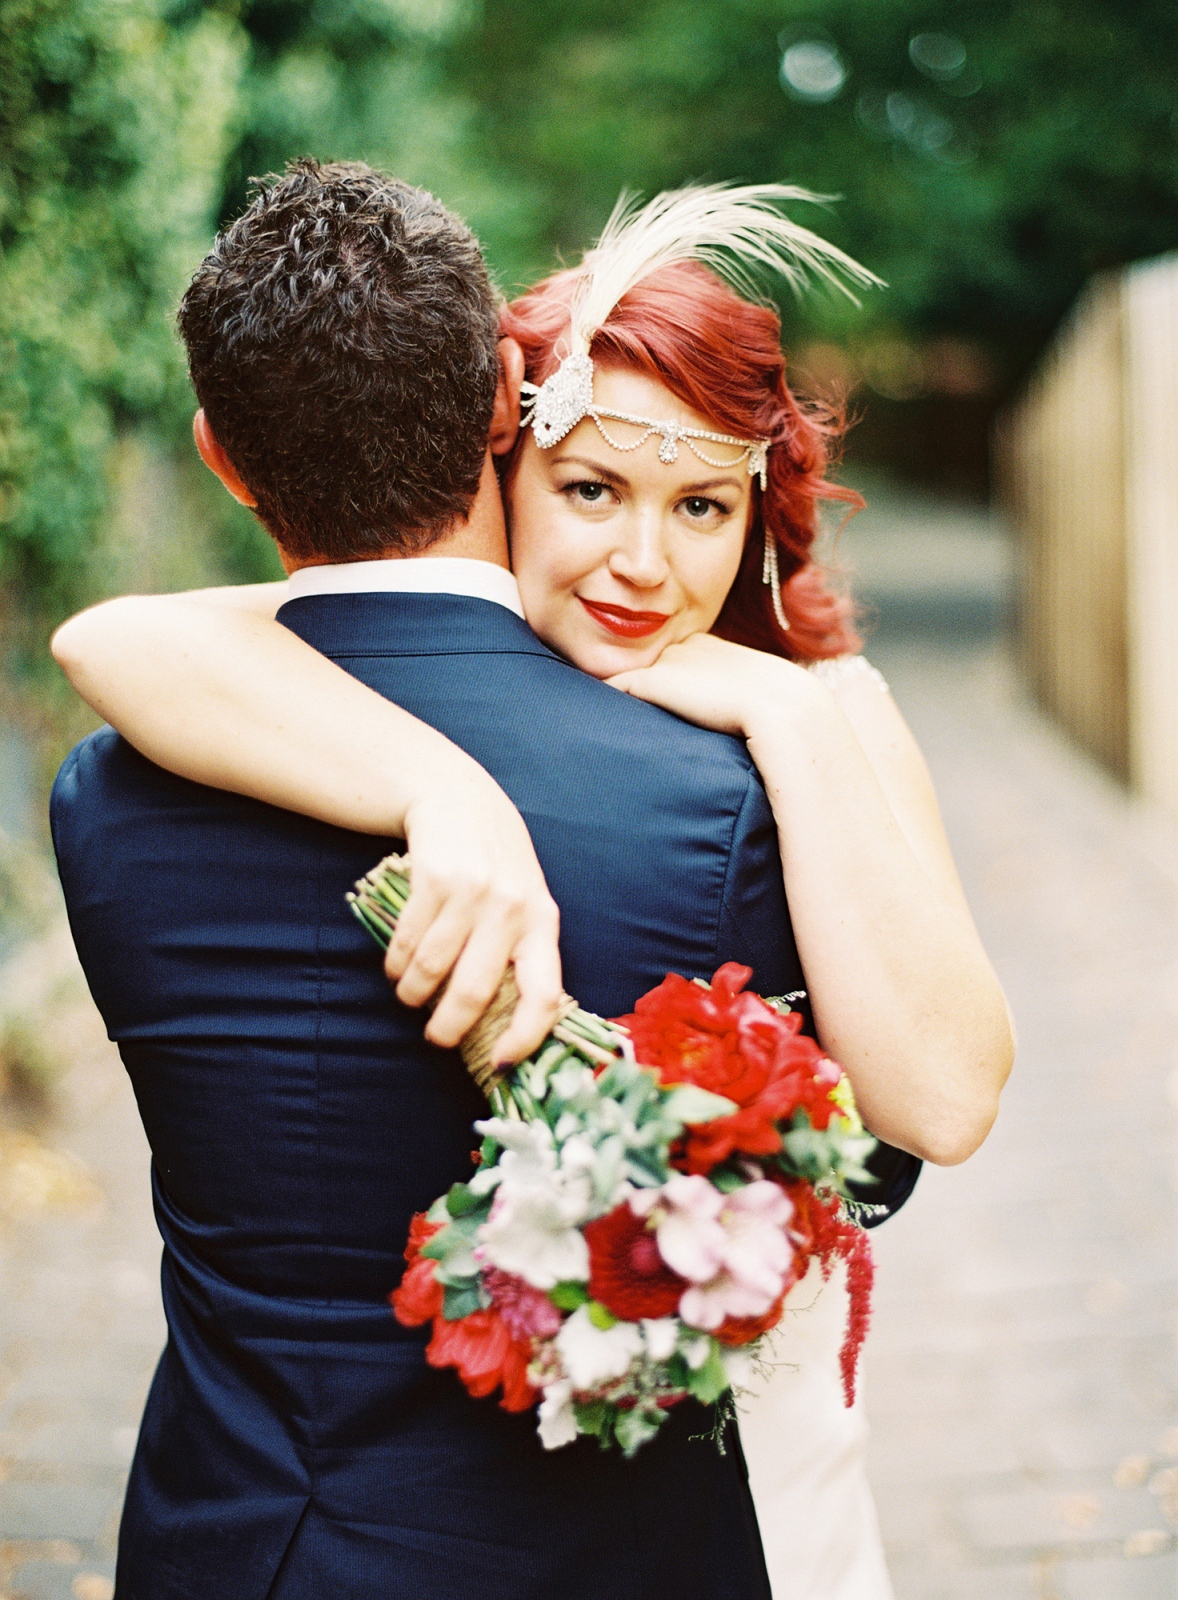 A Decadent Art Deco Inspired Wedding from Stewart Leishman